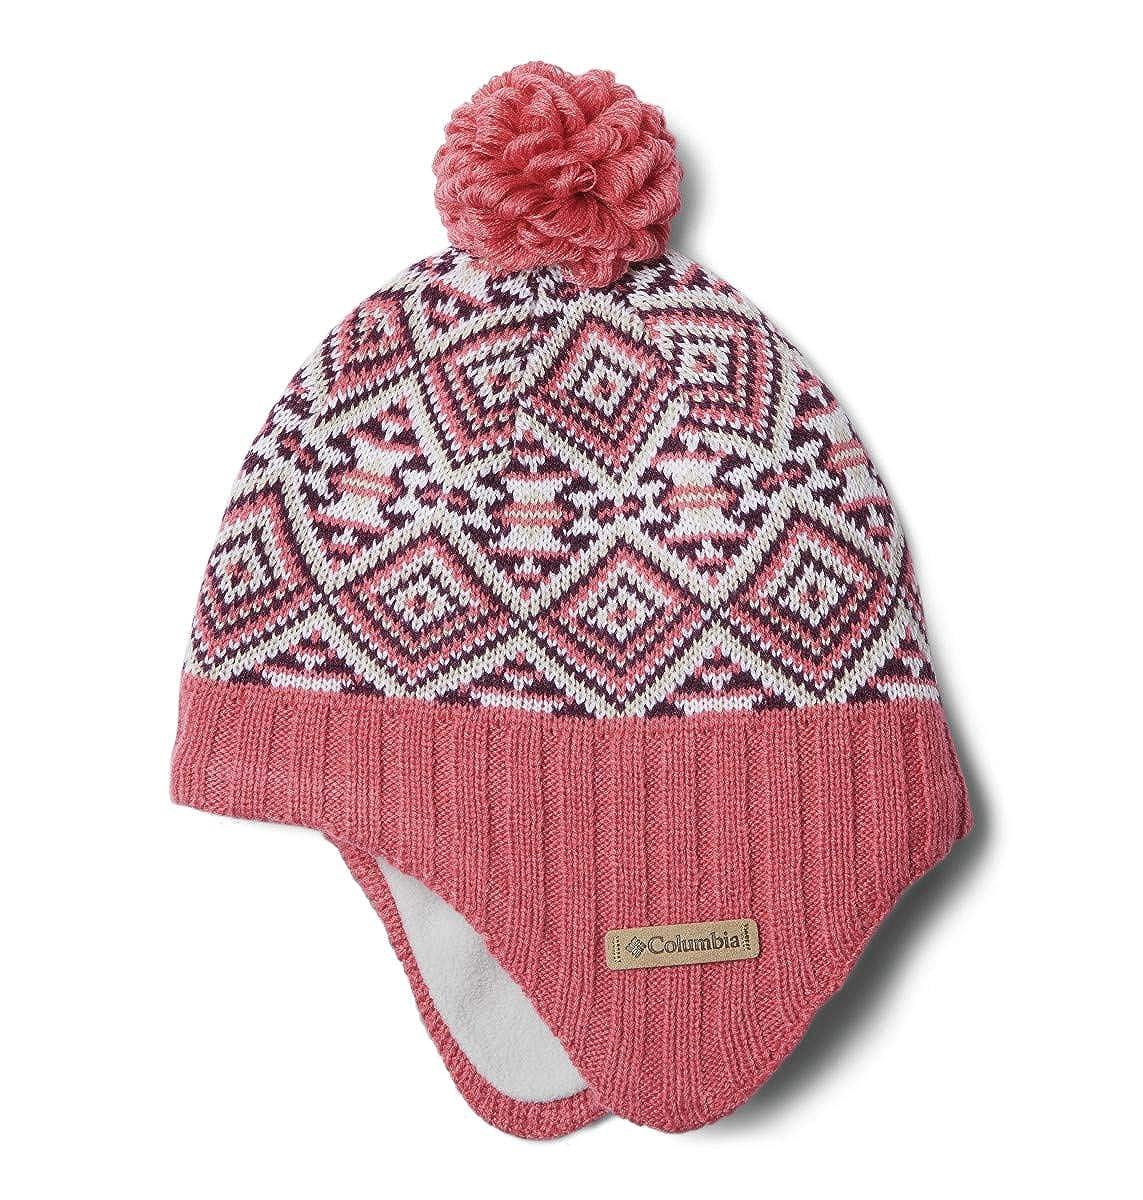 Columbia unisex-child Winter Worn II Peruvian Beanies /& Knit Hats